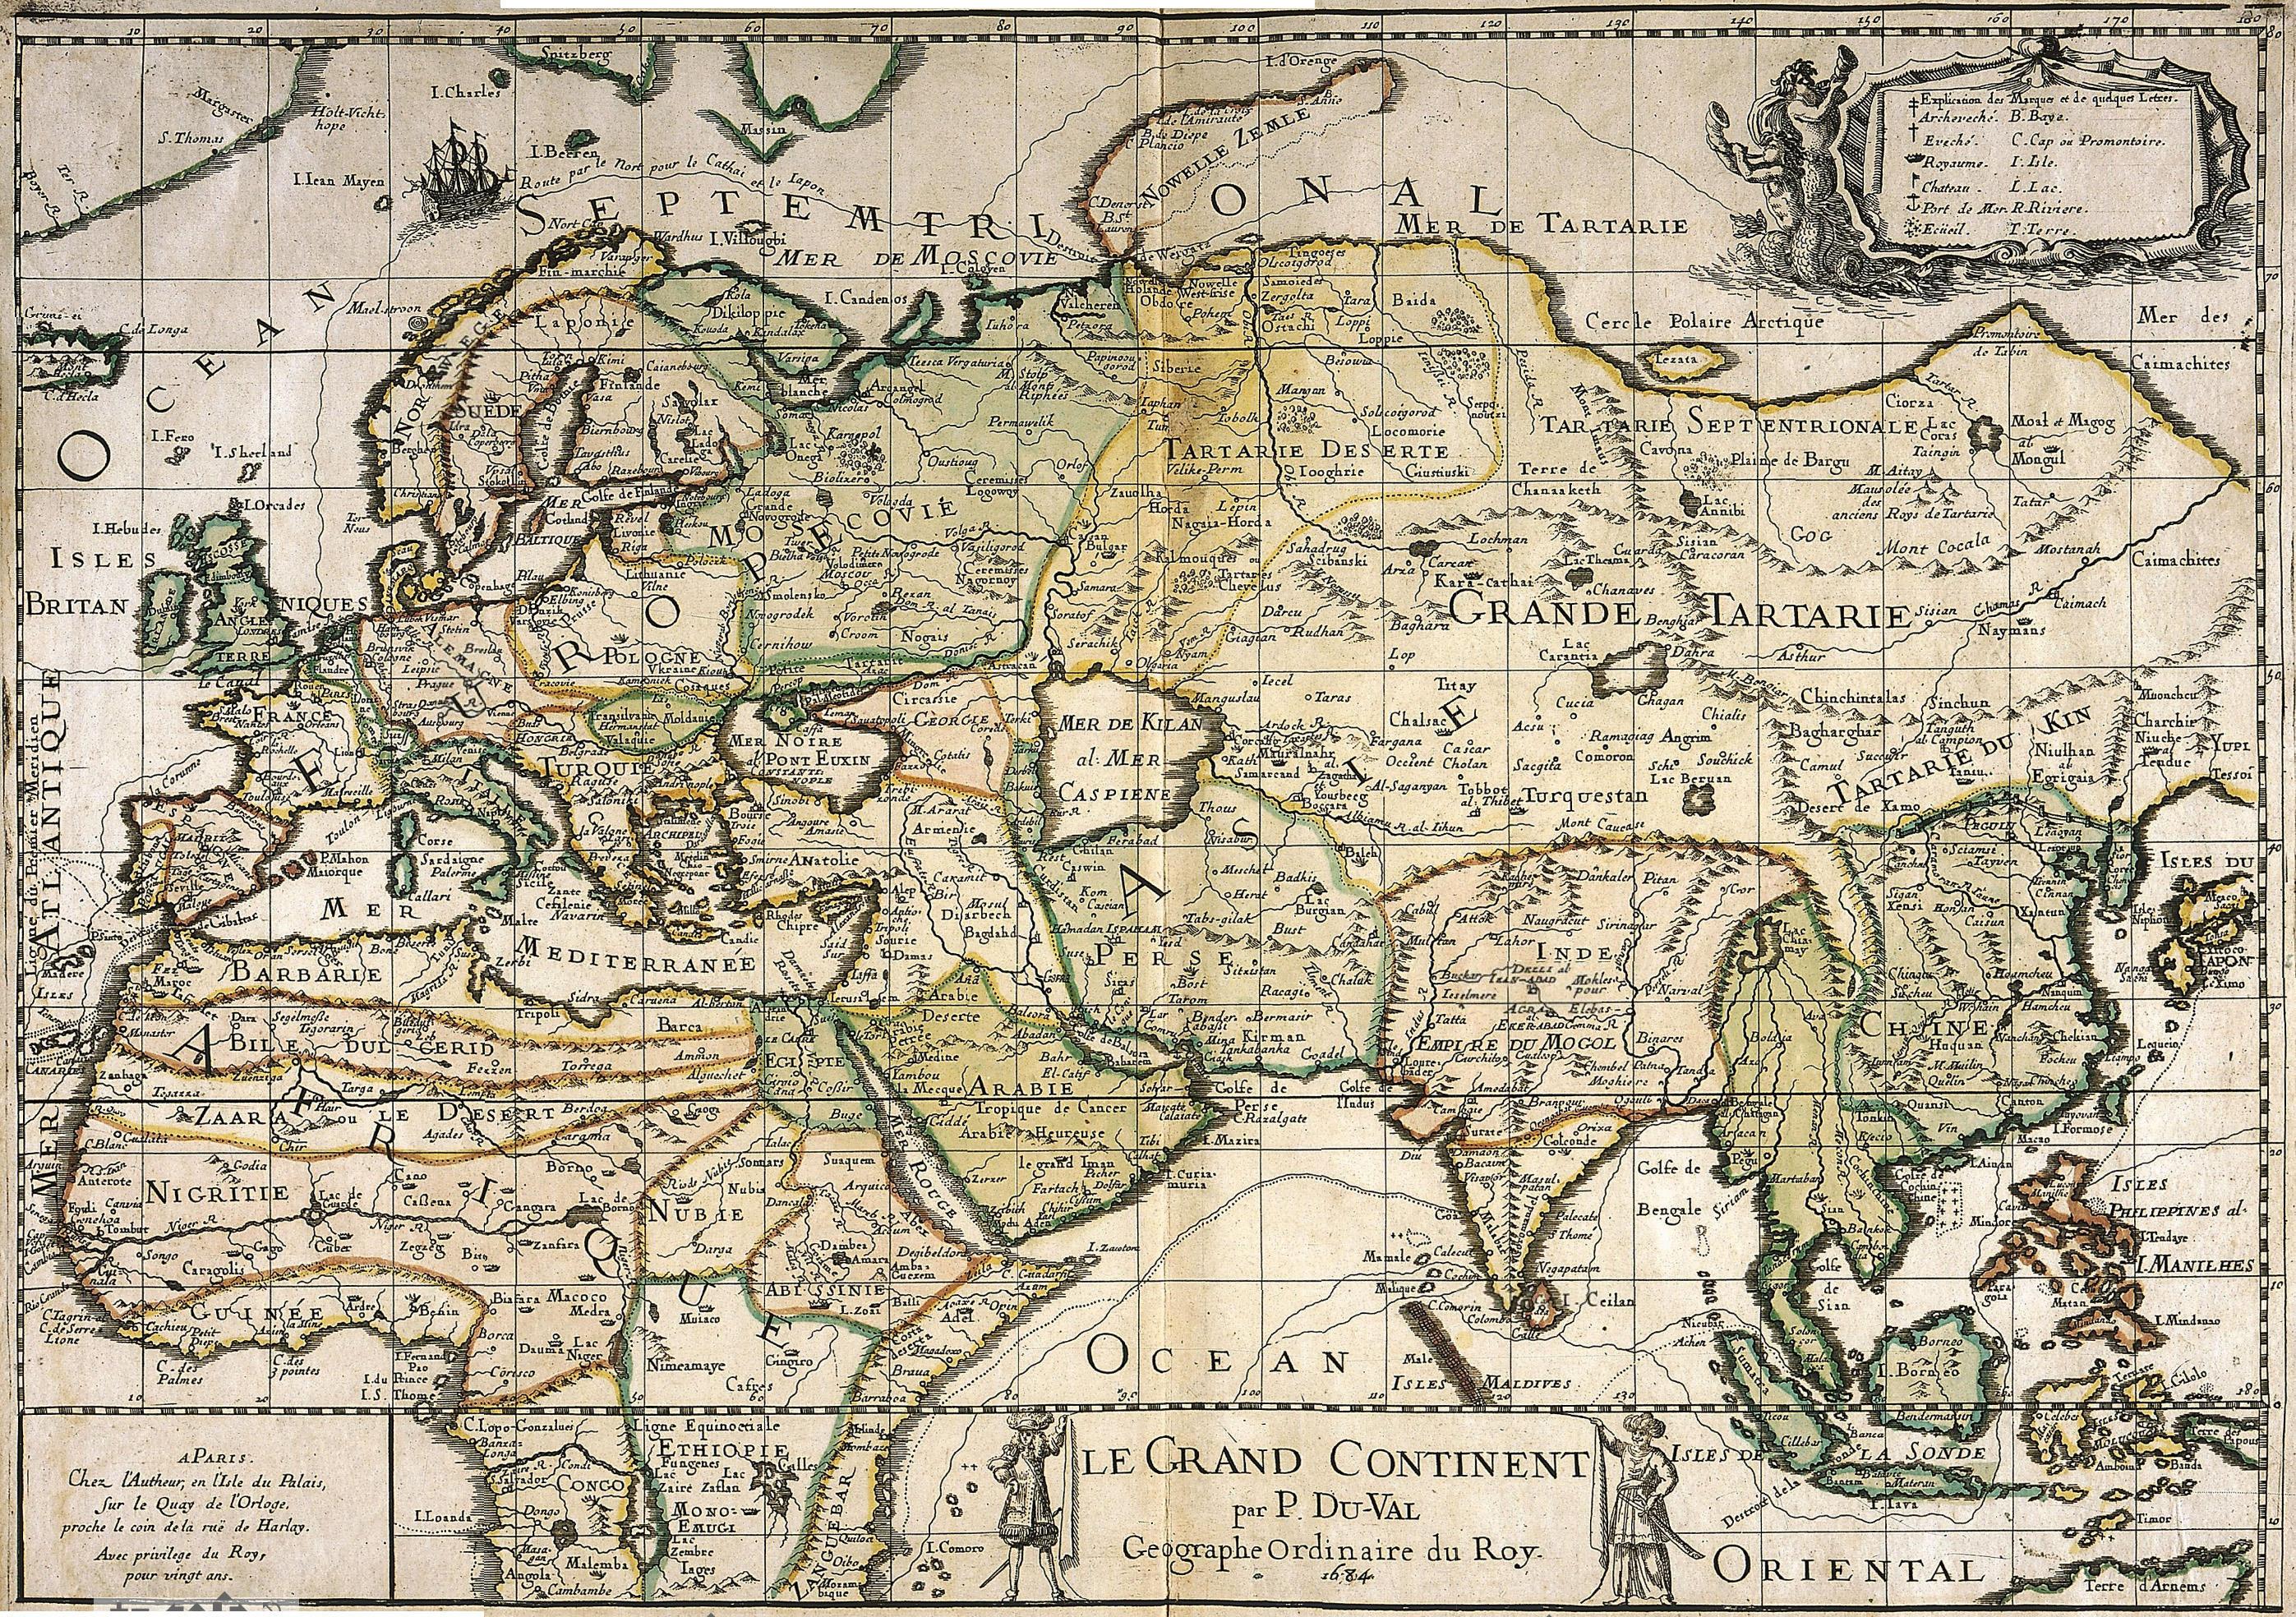 1684_Le_Grand_Continent_Du_Val.jpg